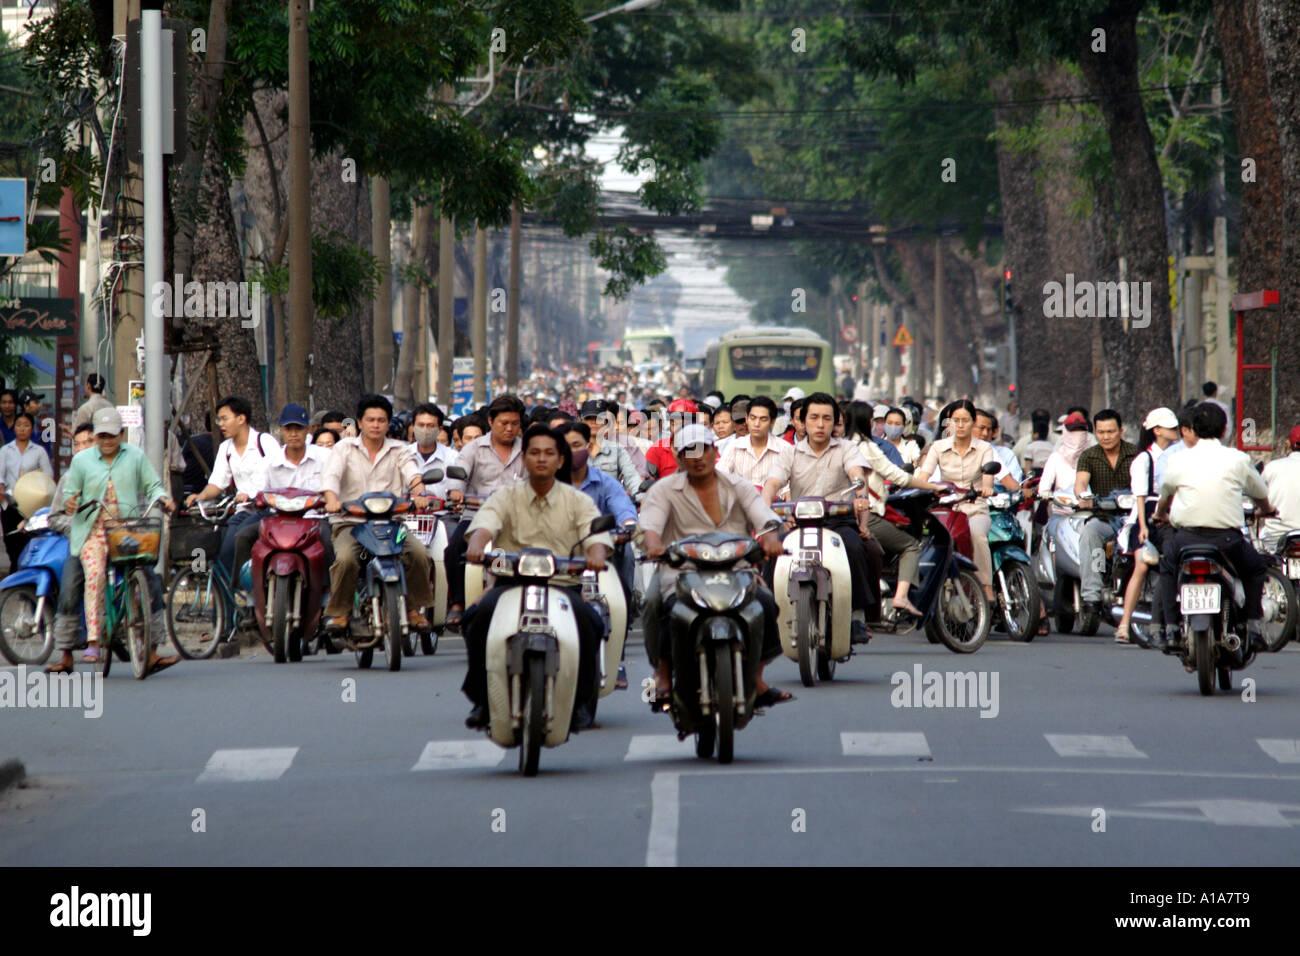 Very busy street traffic in Saigon, HCMC, Vietnam III ...